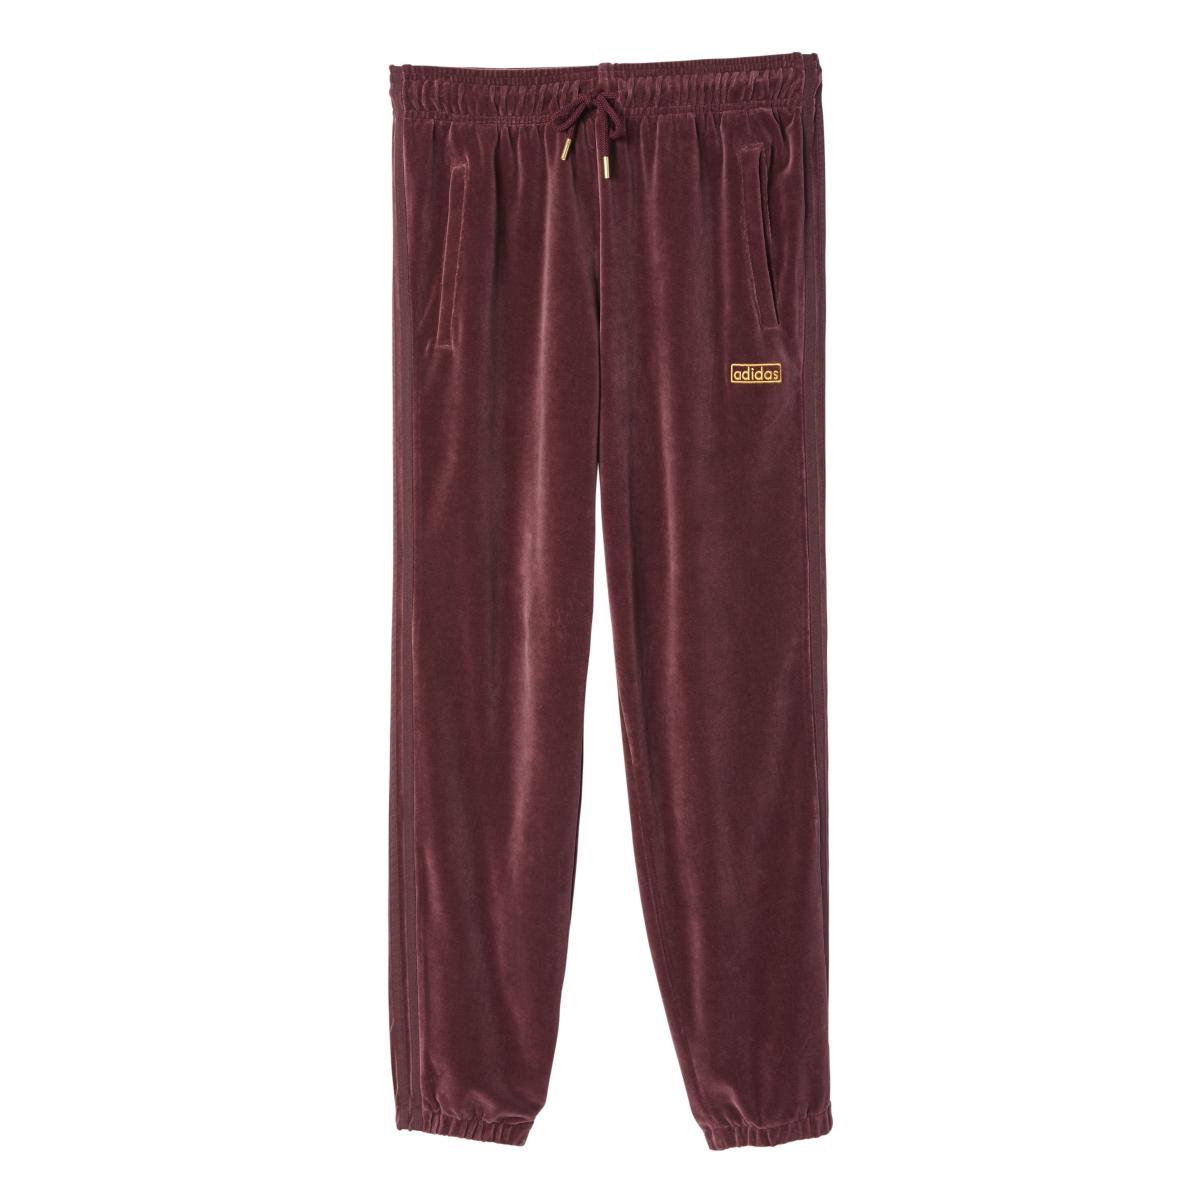 Adidas Originals Velour Men's Sweat Pants Maroon  ay9231